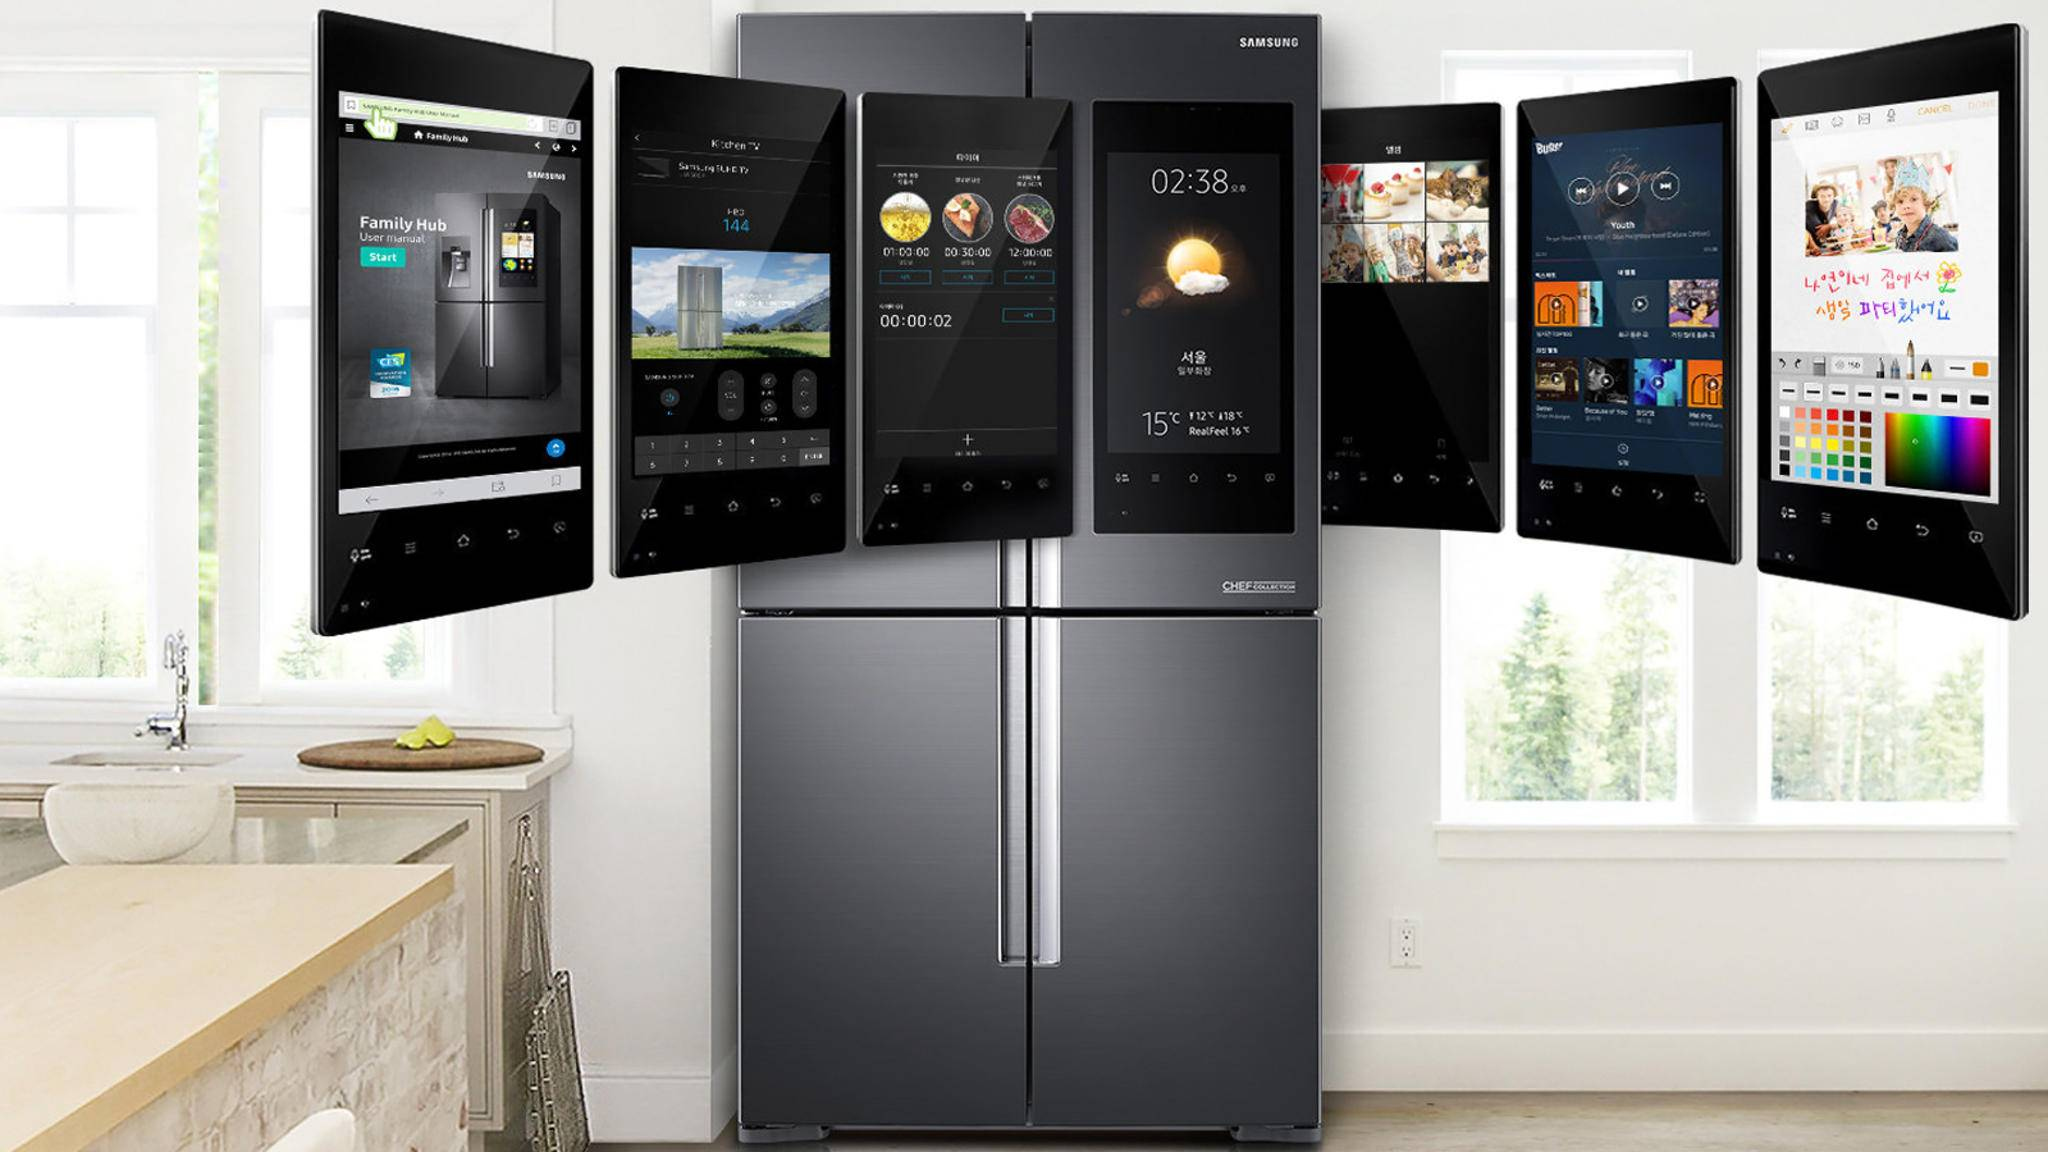 Side By Side Kühlschrank French Door Samsung : Side by side kühlschrank test die besten im vergleich